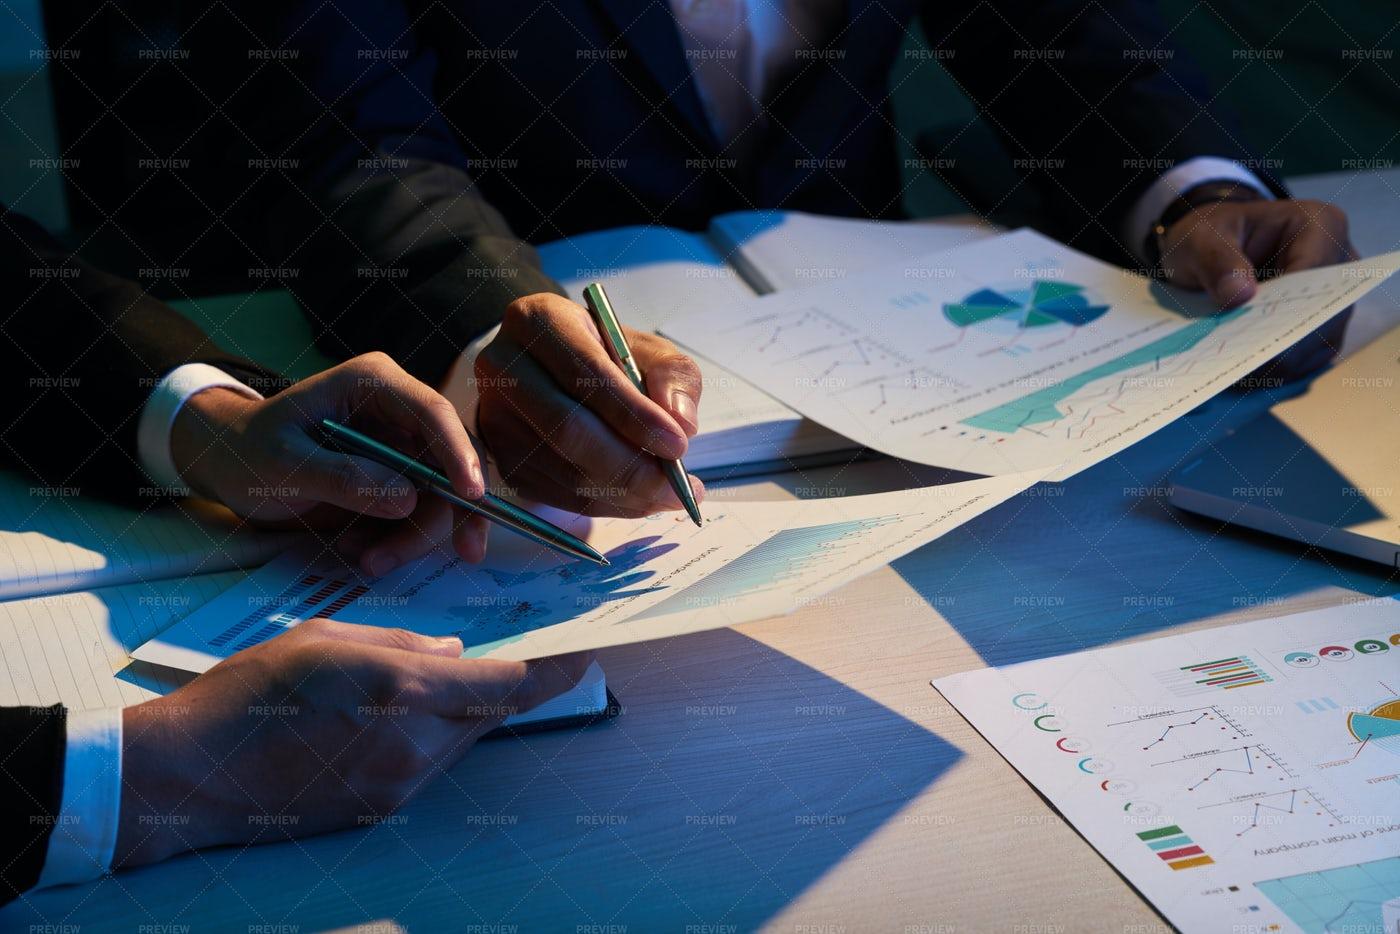 Analyzing Data: Stock Photos